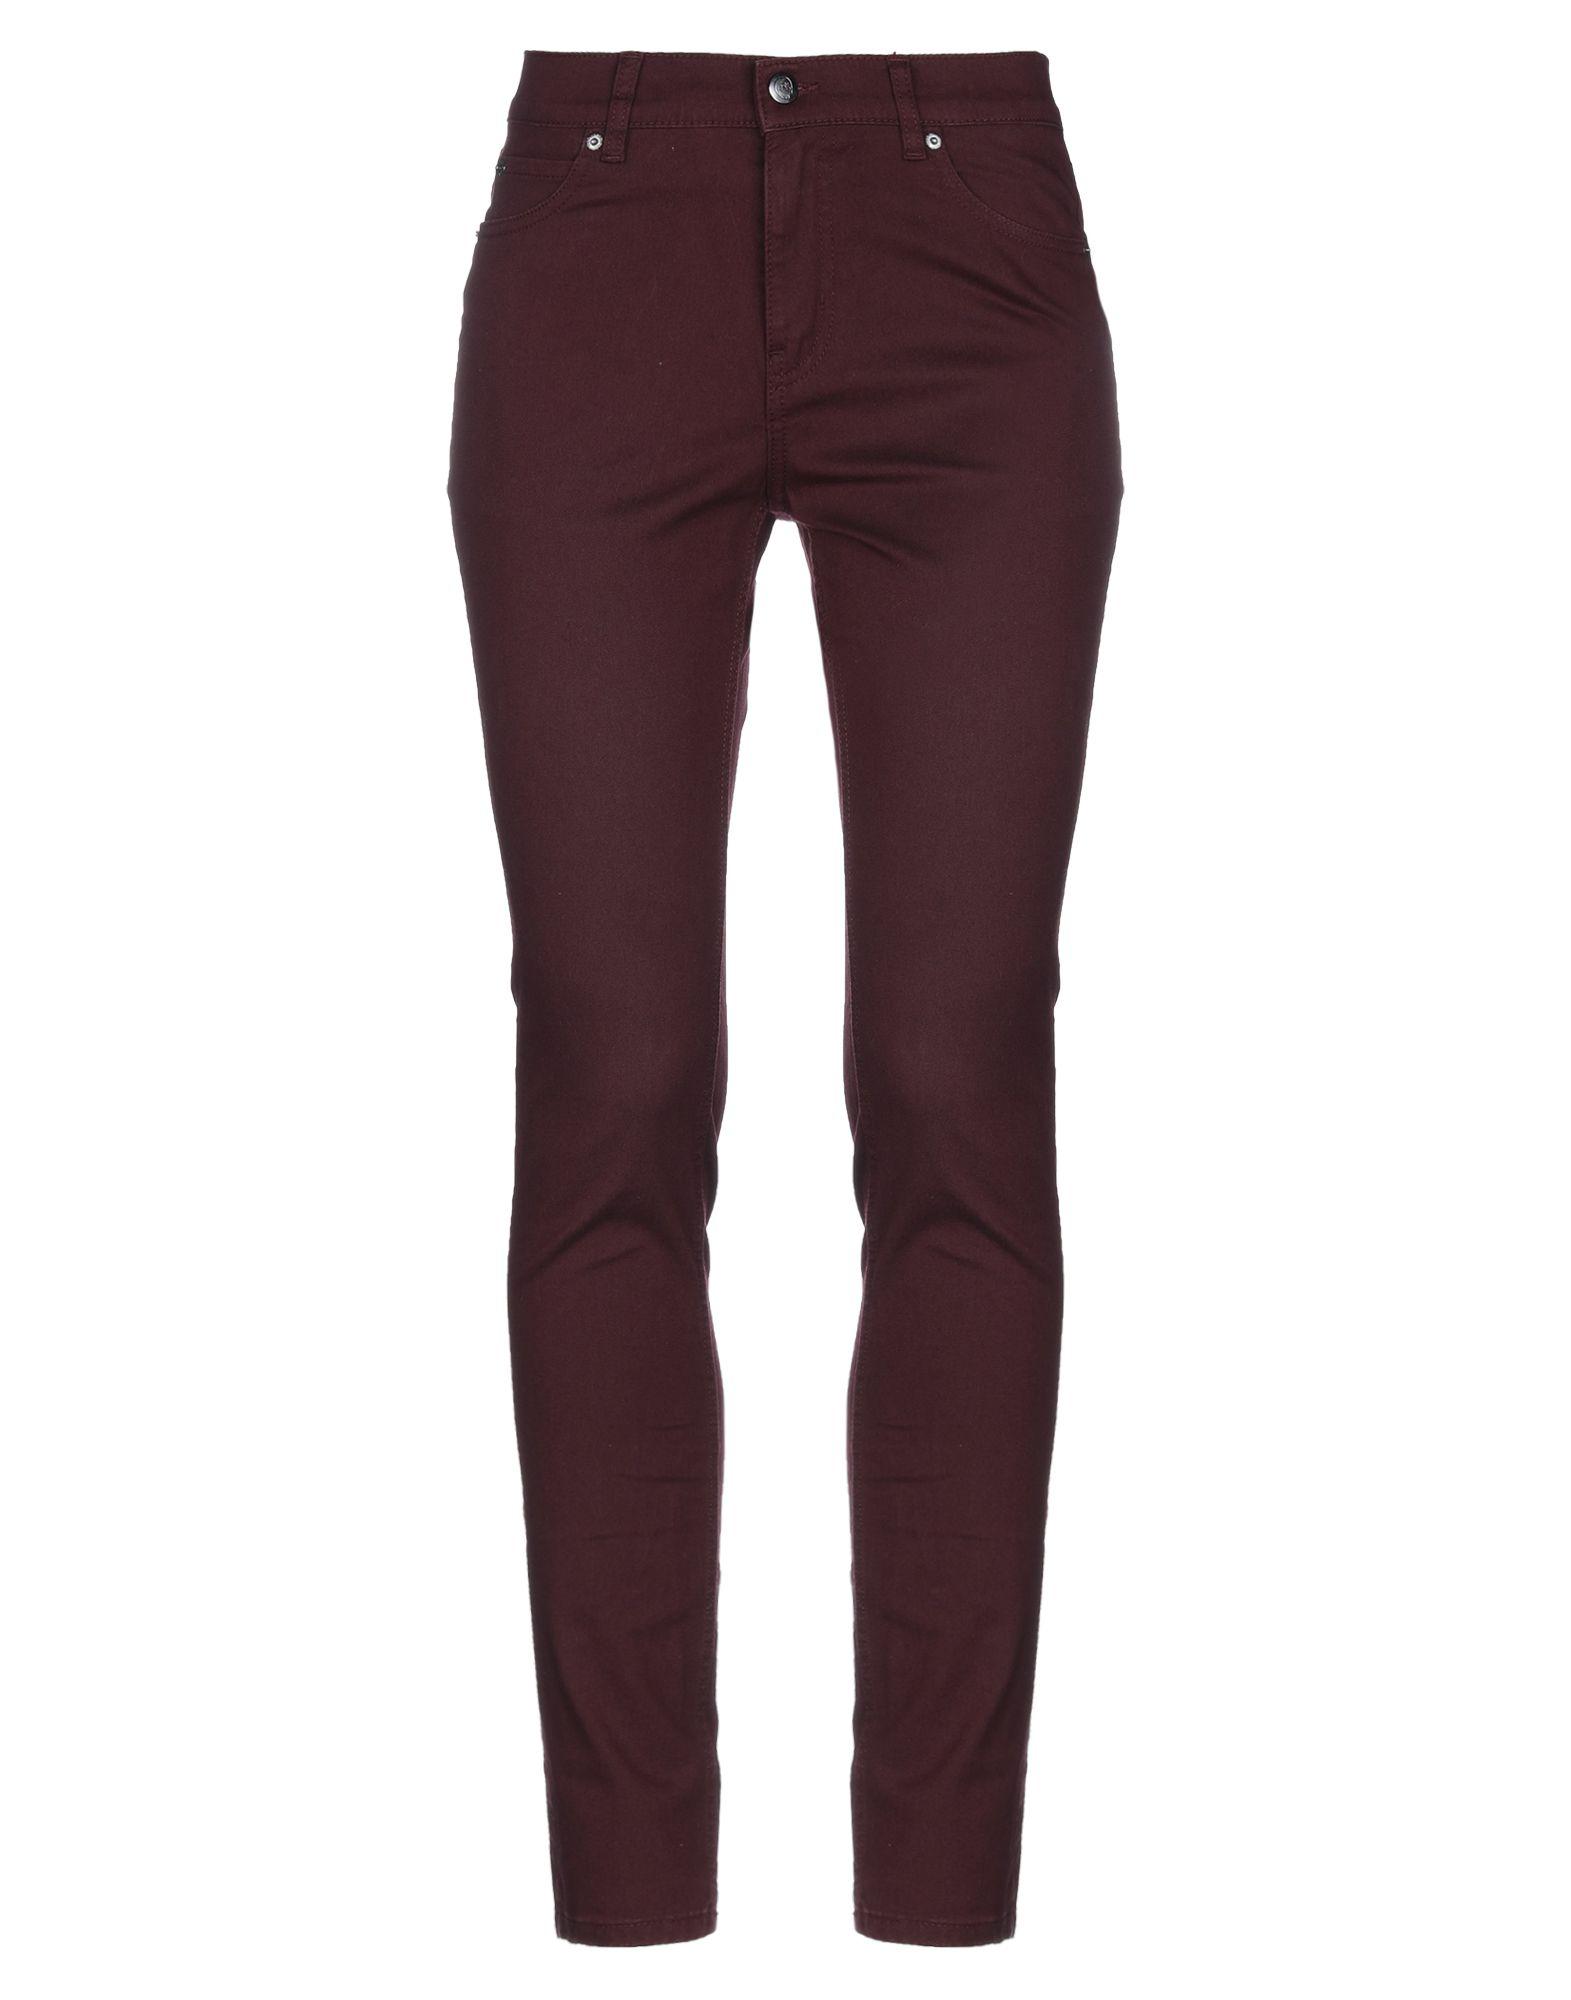 CHEAP MONDAY Повседневные брюки брюки спортивные мужские cheap monday цвет серый 0524638 размер xs 44